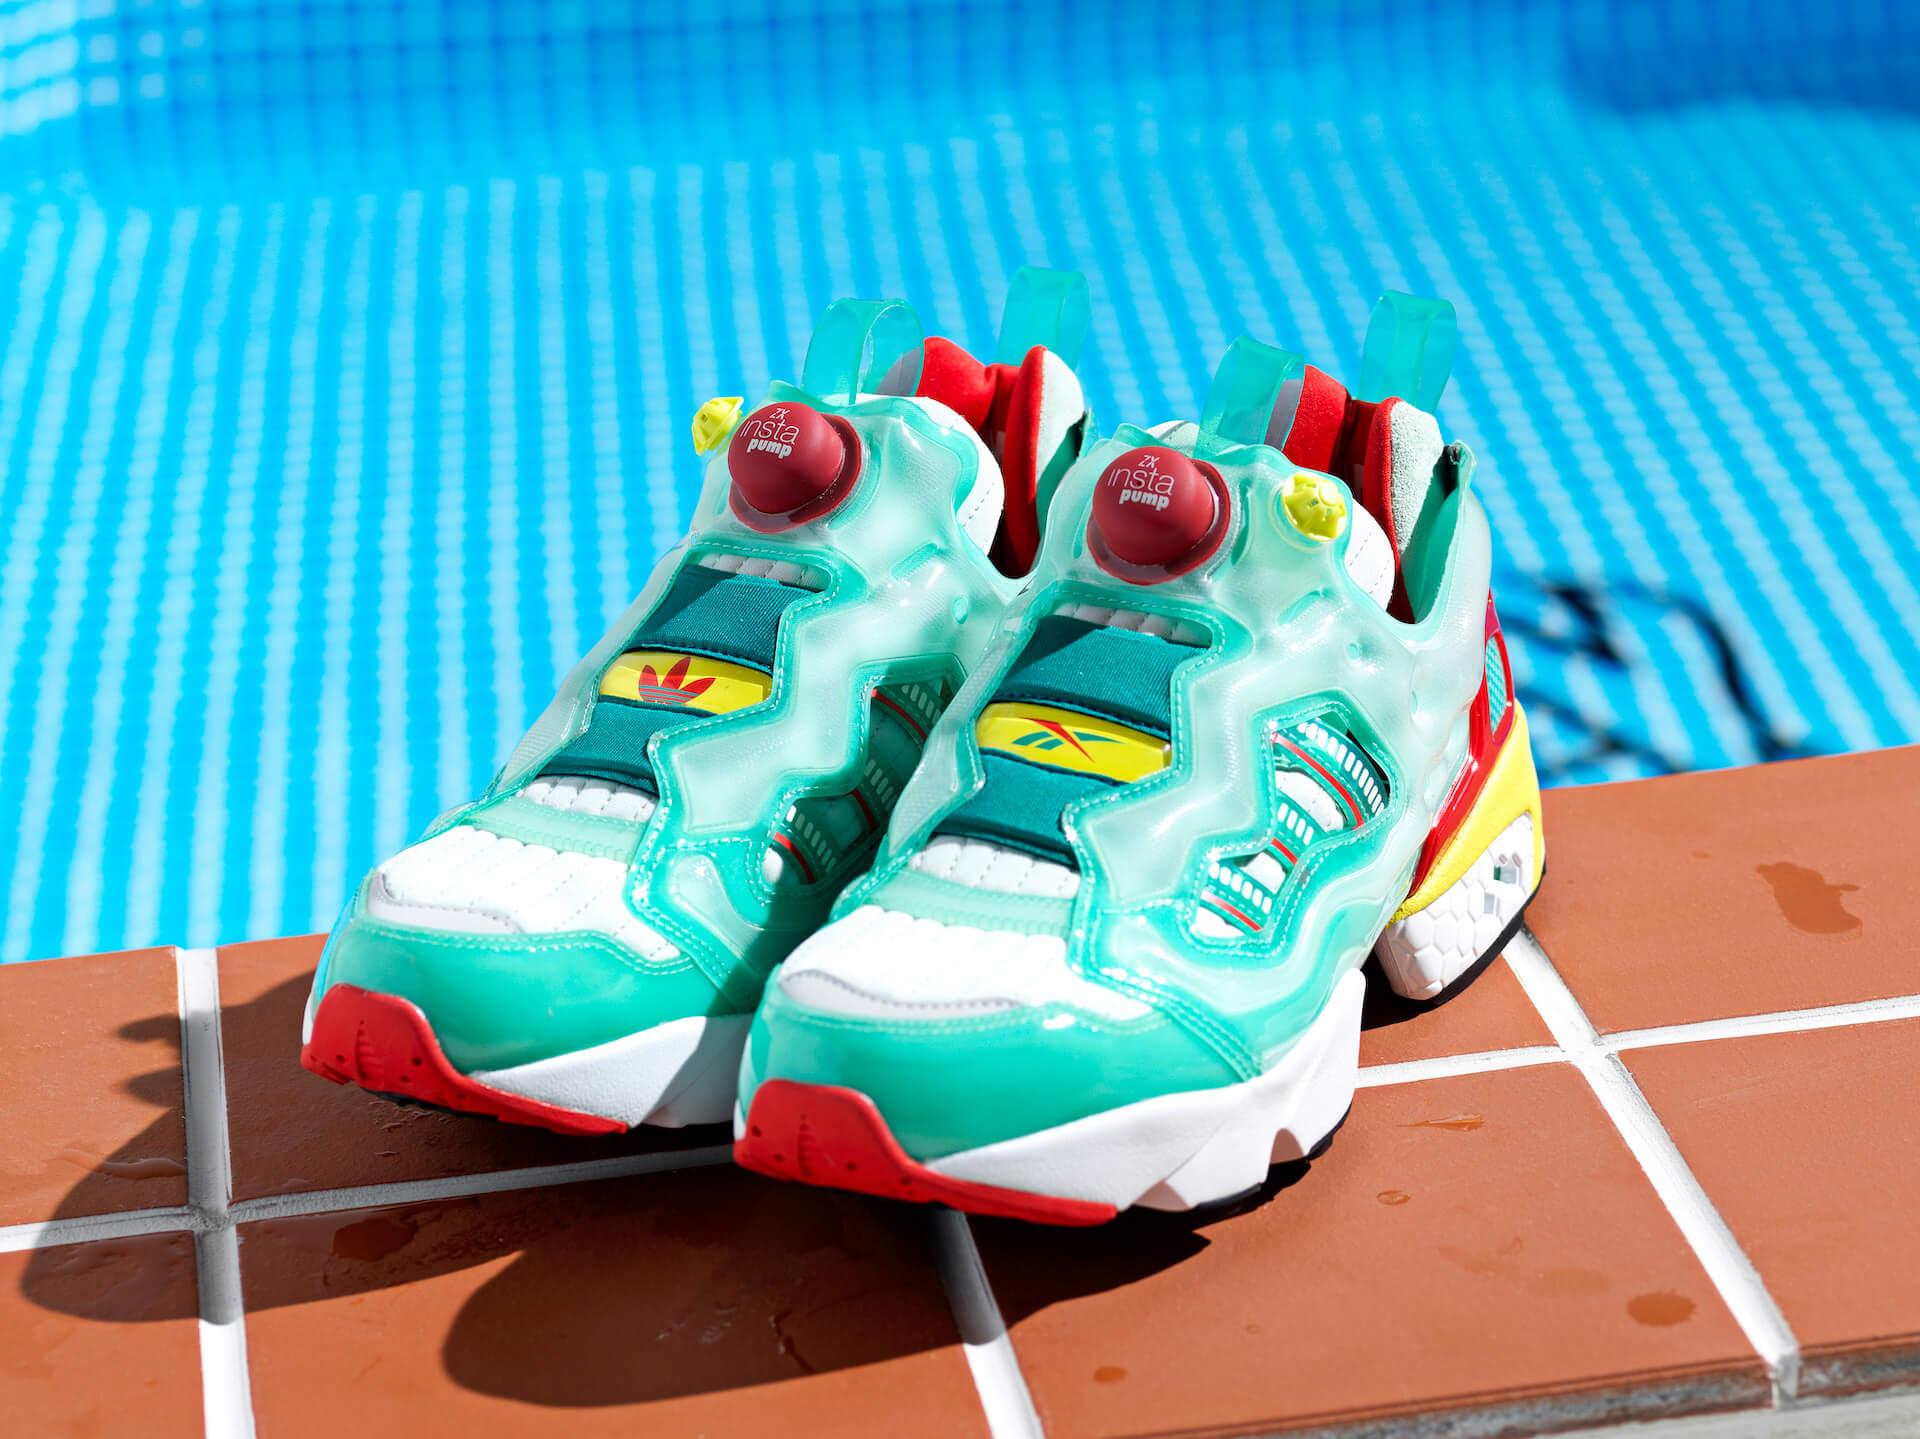 adidas OriginalsとReebokのコラボモデル「ZX FURY」に夏にぴったりの新色4色が登場! life210719_adidasoriginals_reebok_4